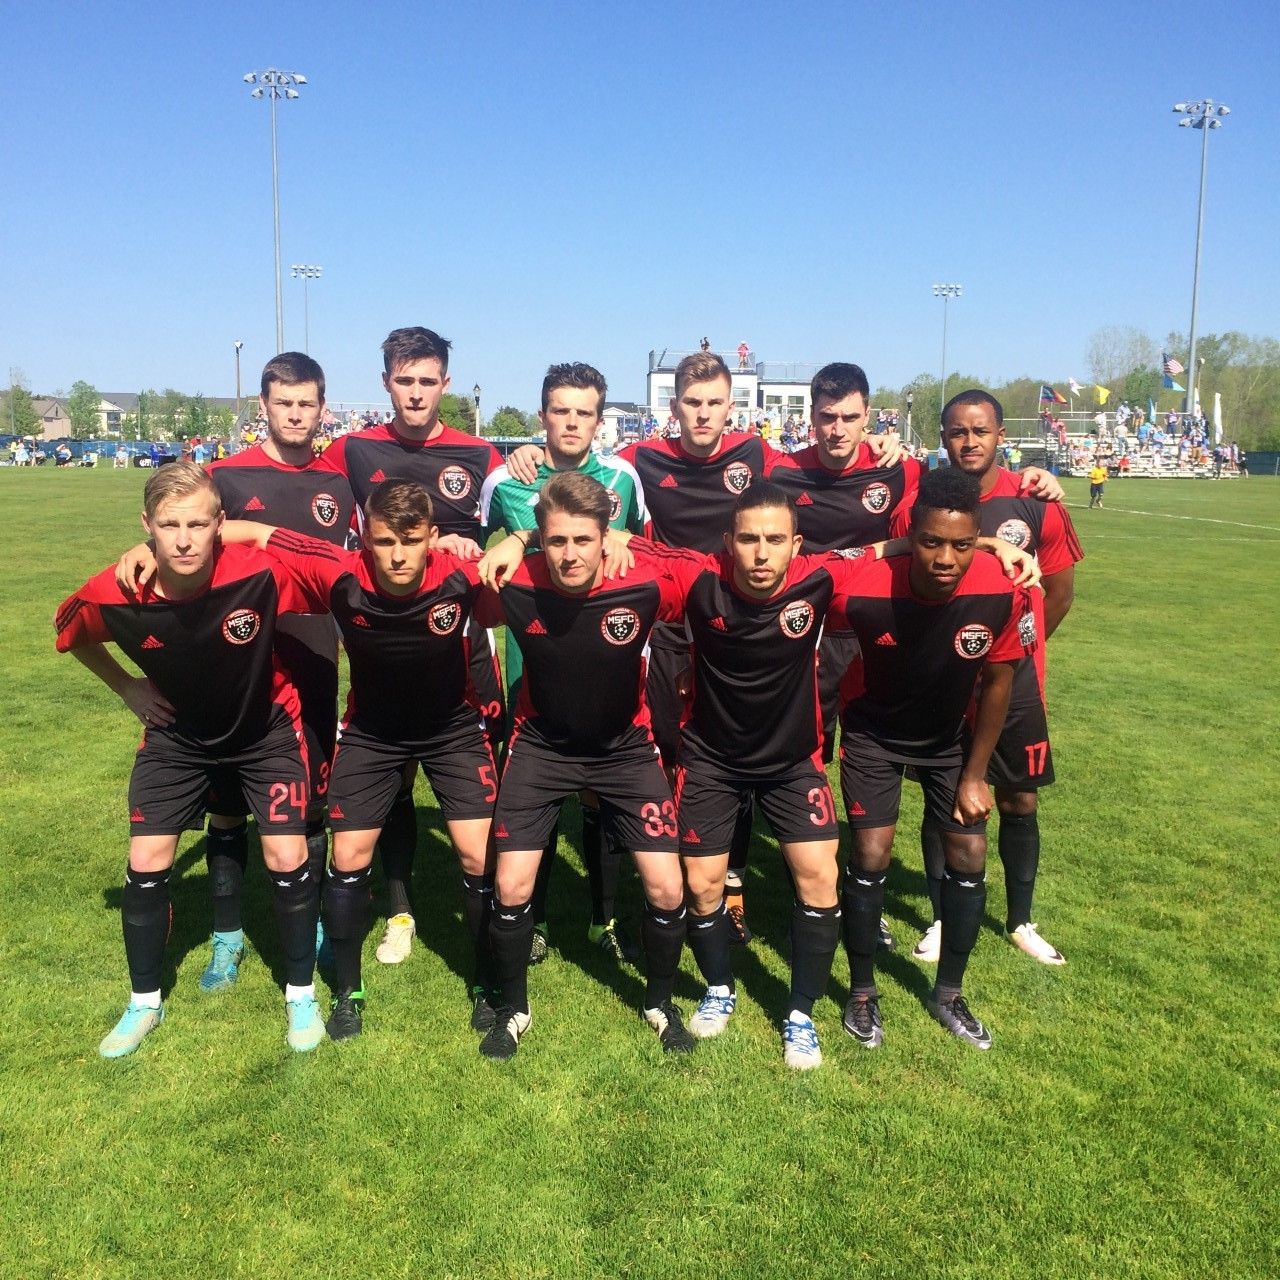 Michigan Stars Starting Lineup On Sunday v Lansing United